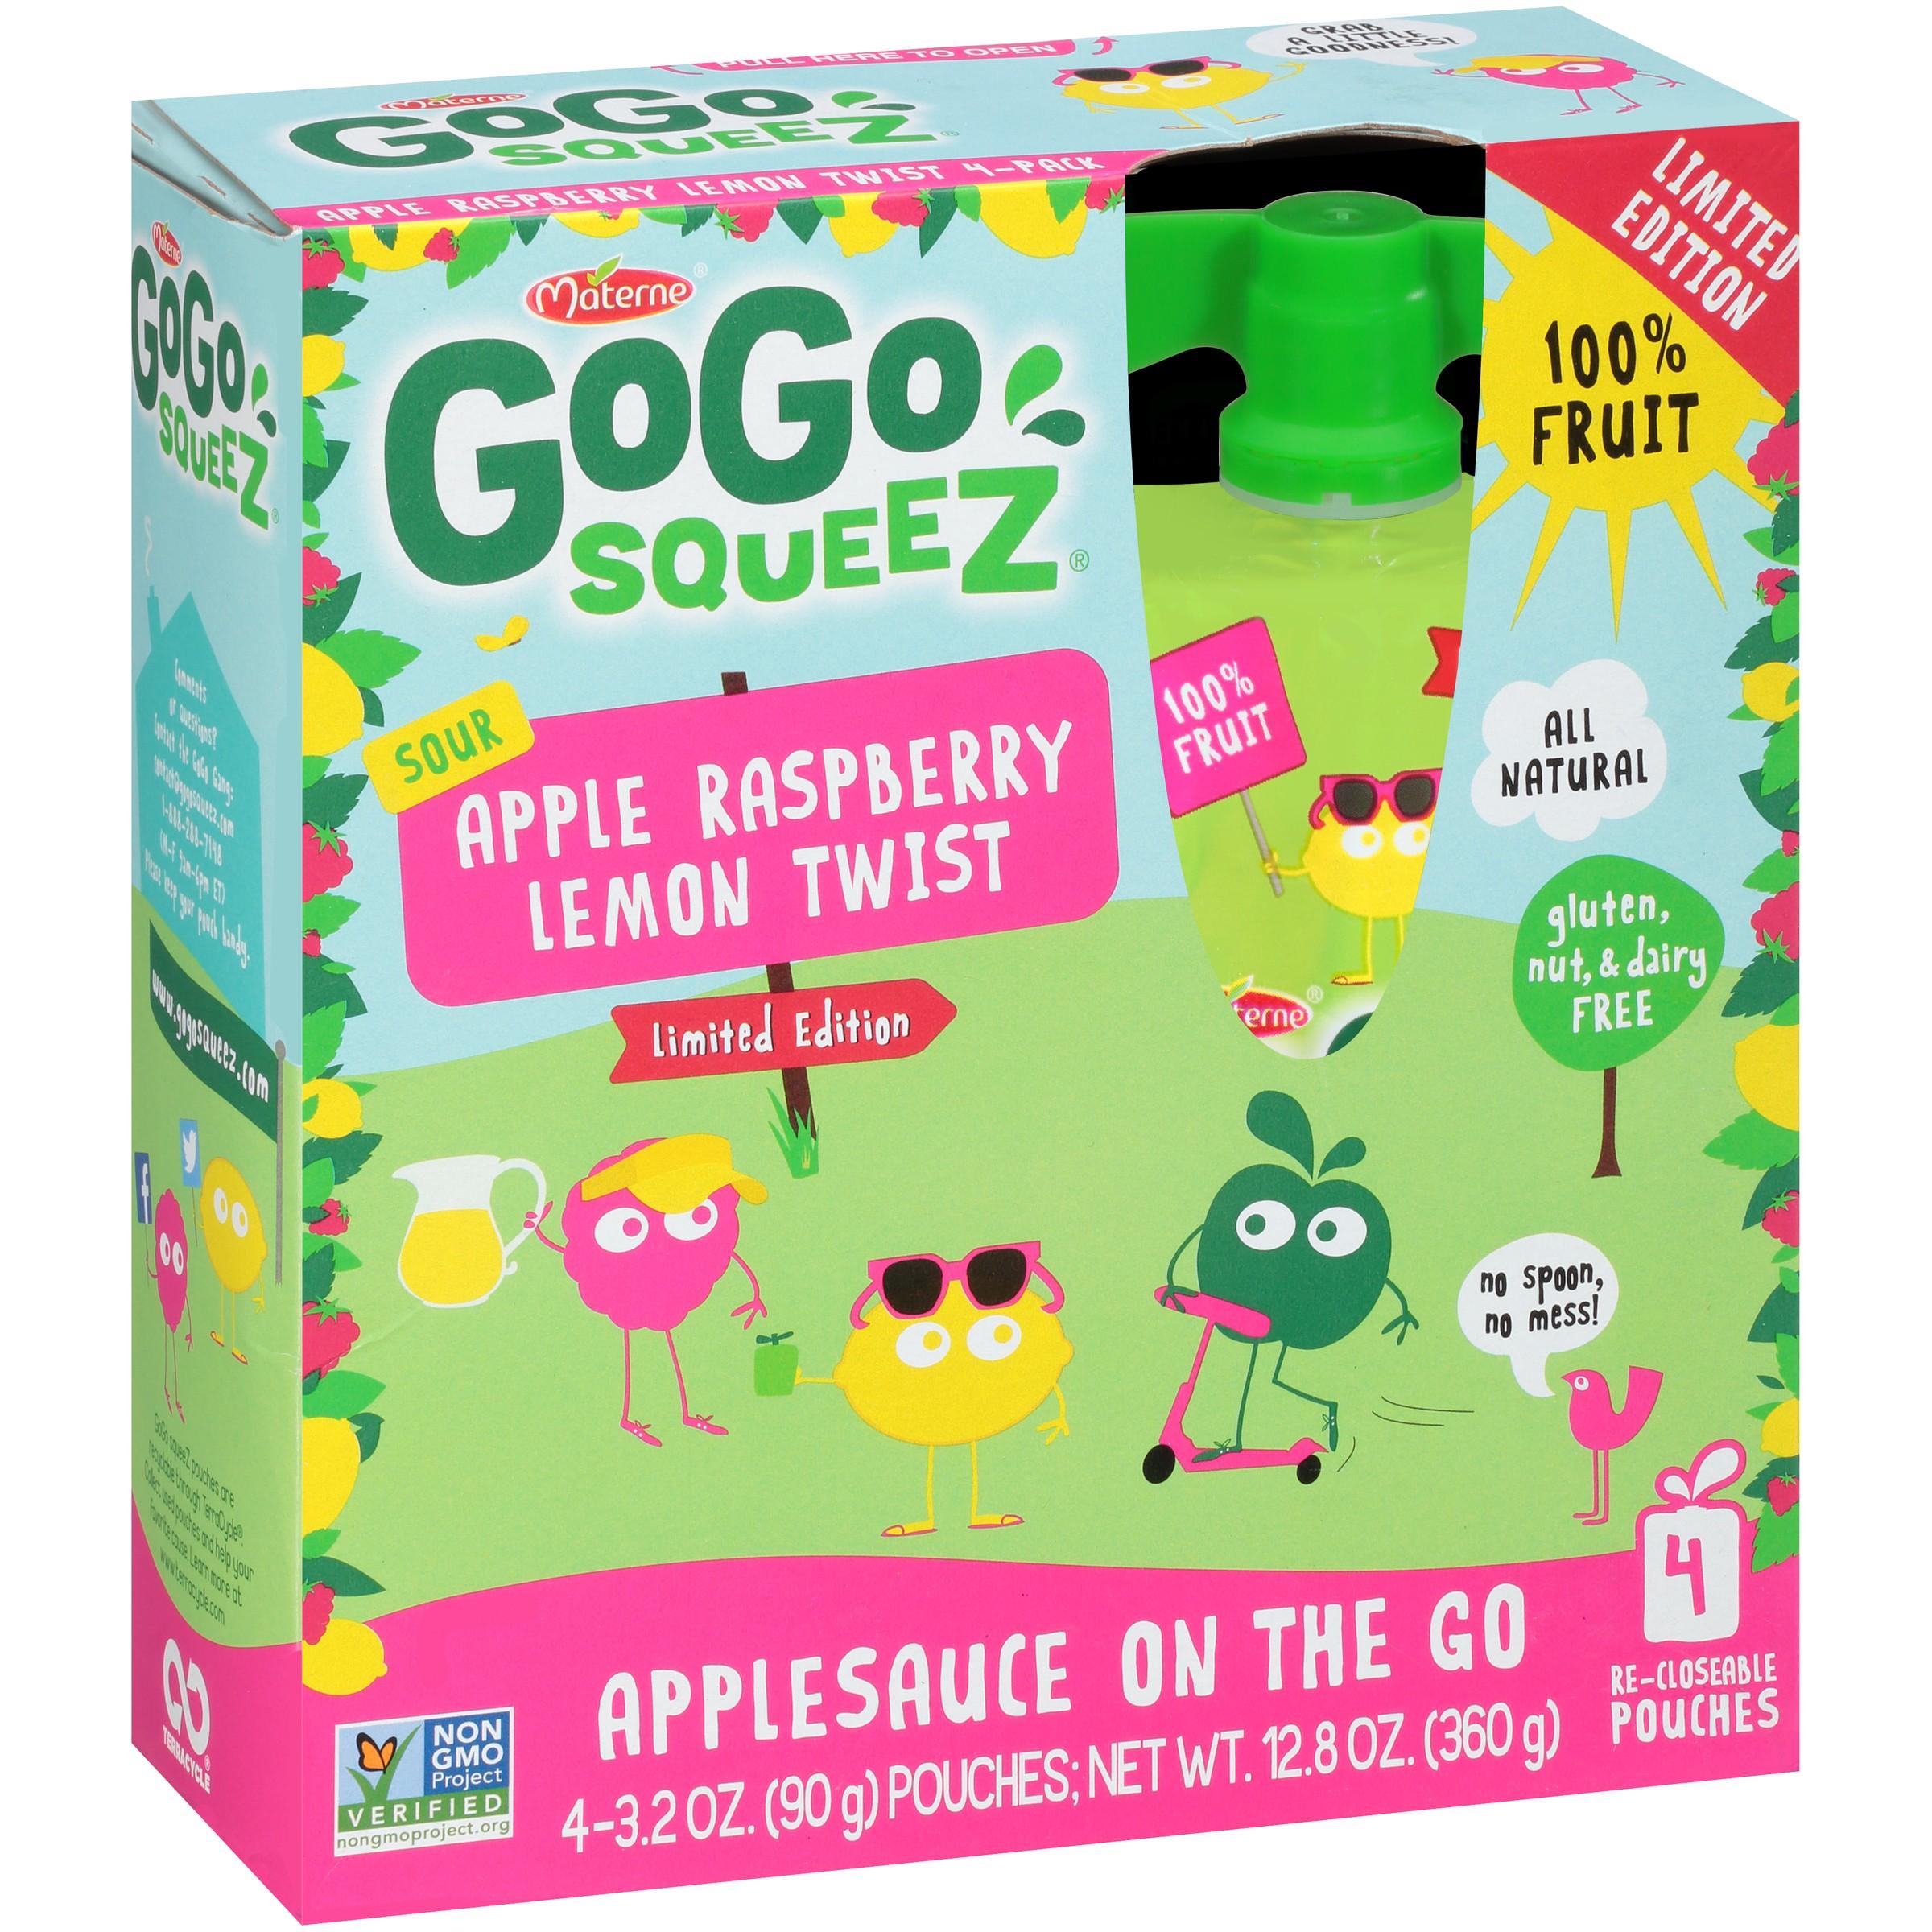 GoGo squeeZ Sour Apple Raspberry Lemon Twist Applesauce on the Go 4-3.2 oz. Pouches